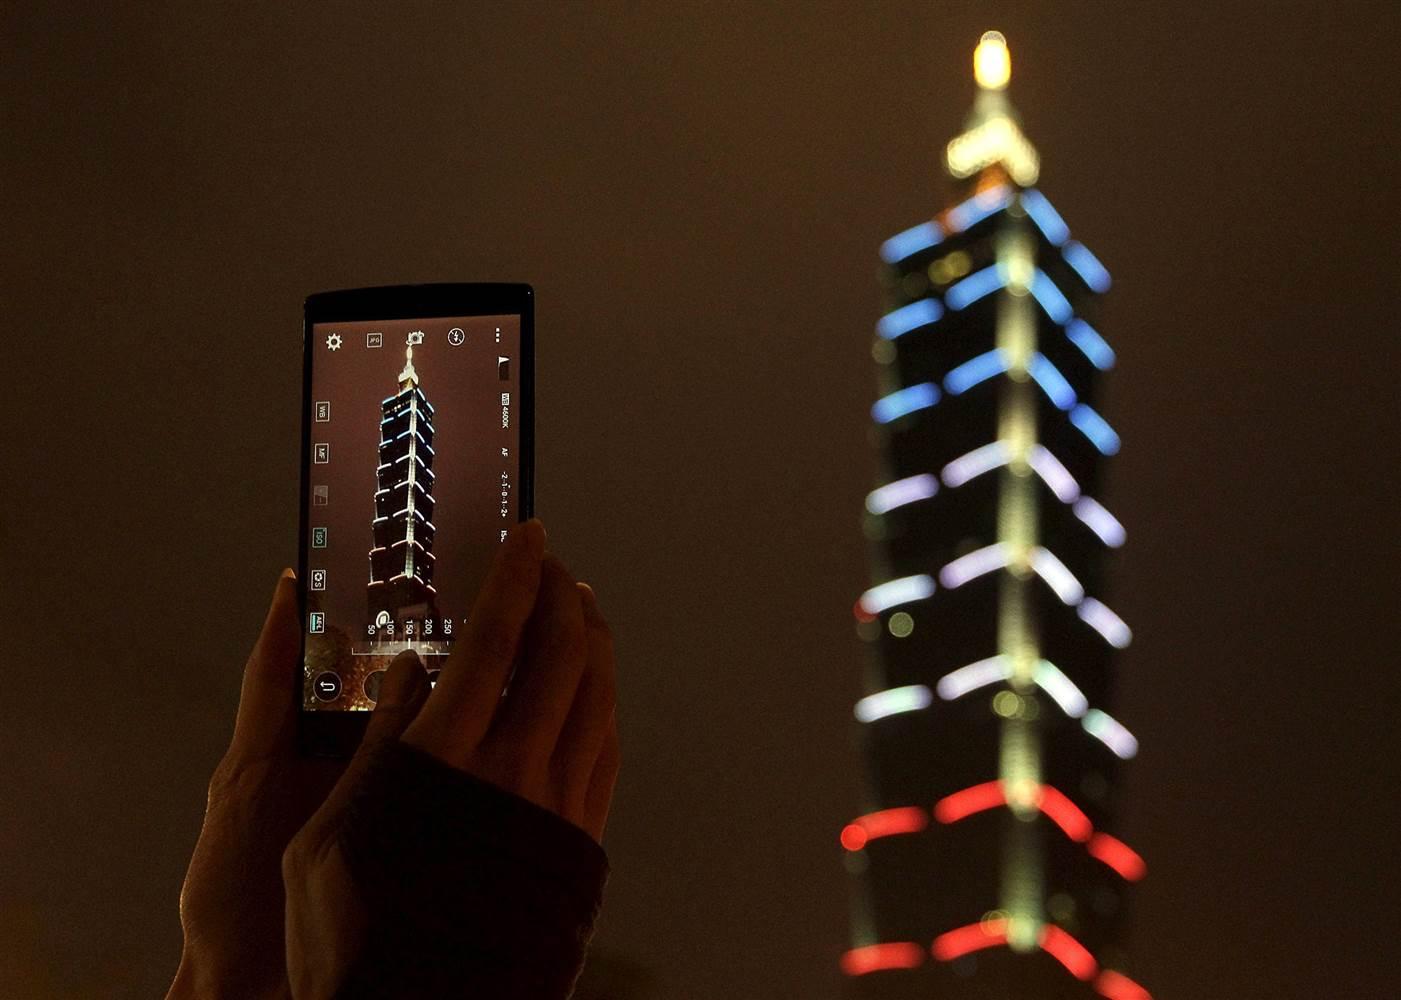 Taipei, photo: Pichi Chuang / Reuters